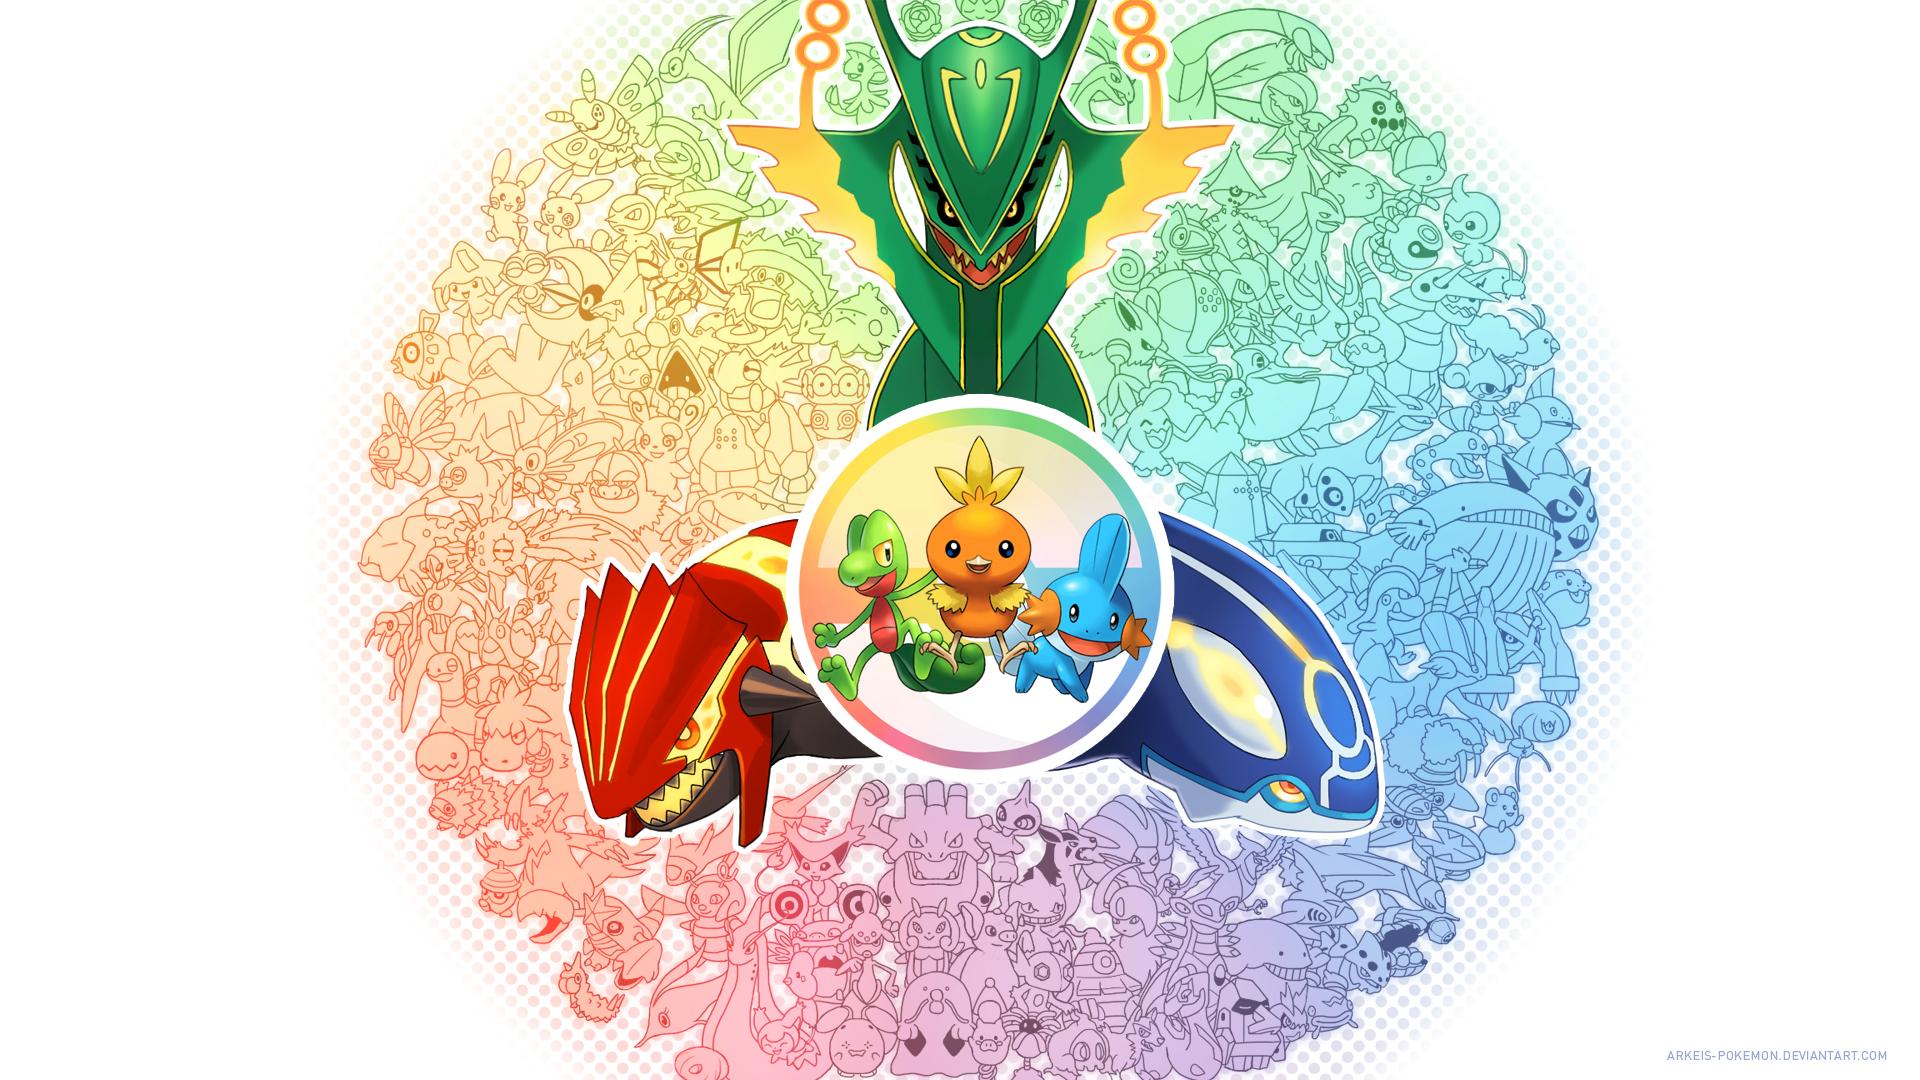 Wallpaper Generation 3 By Arkeis Pokemon On Deviantart